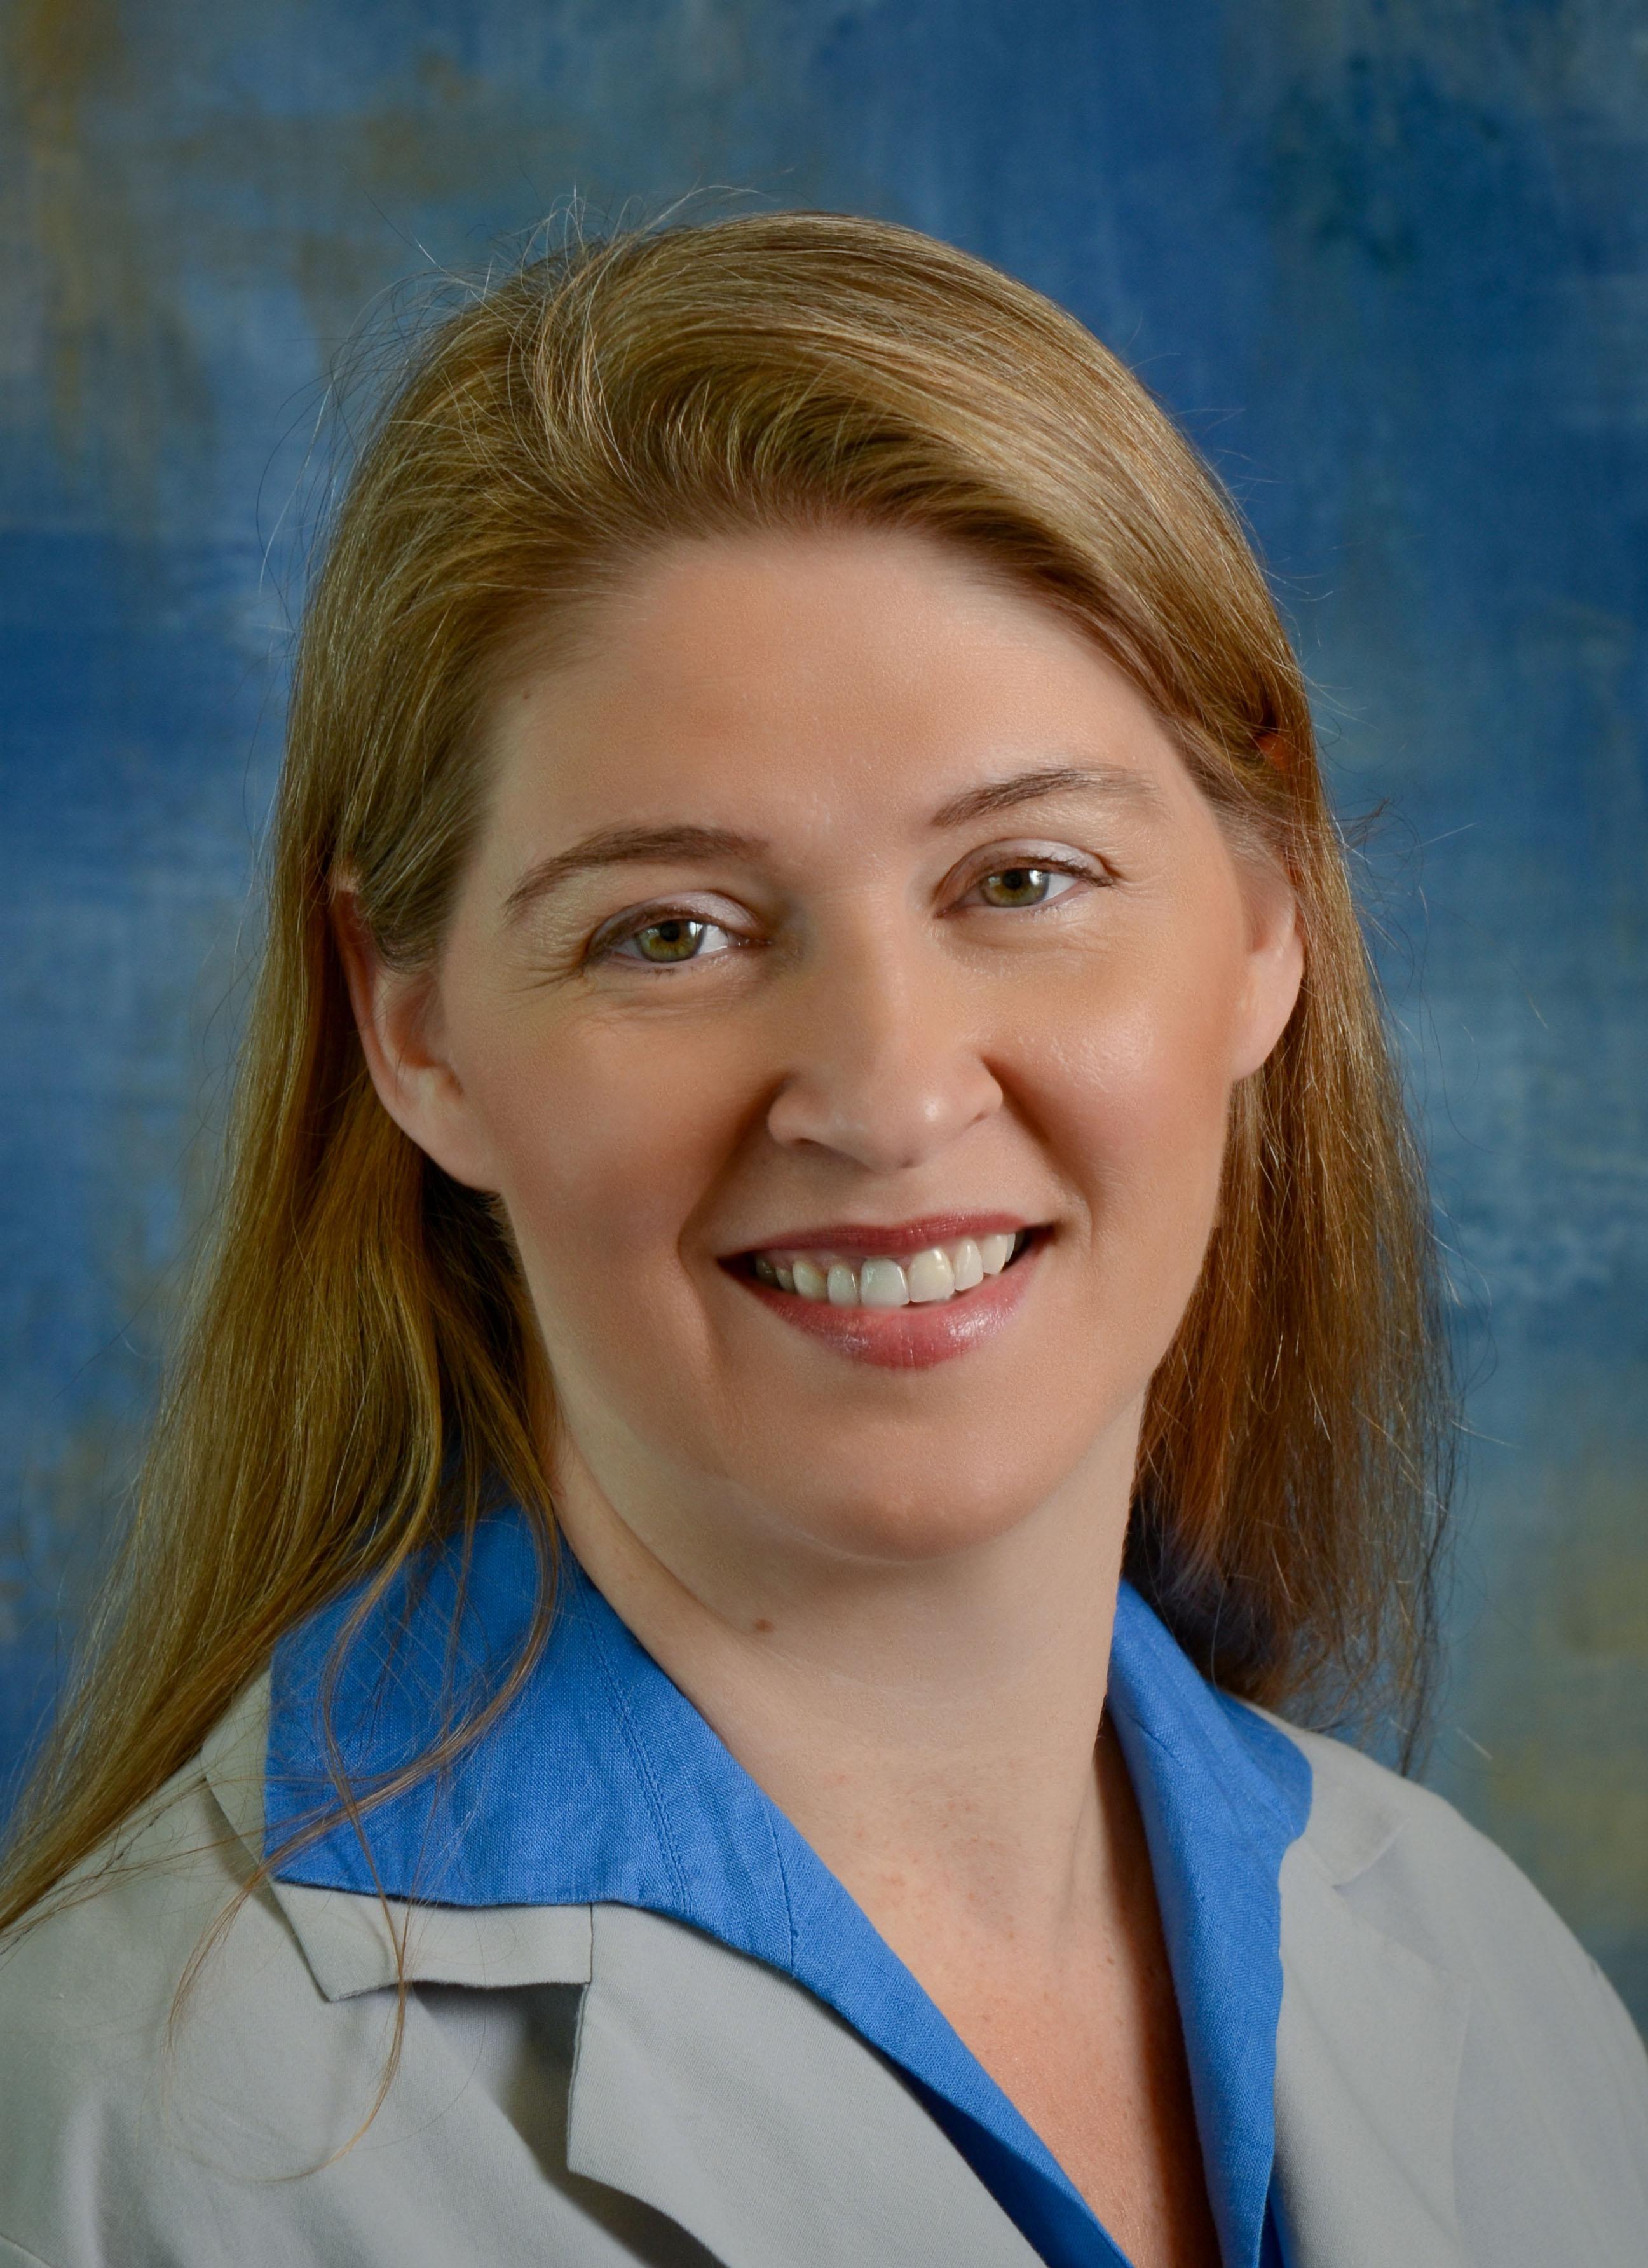 Diane K. Sierens, MD